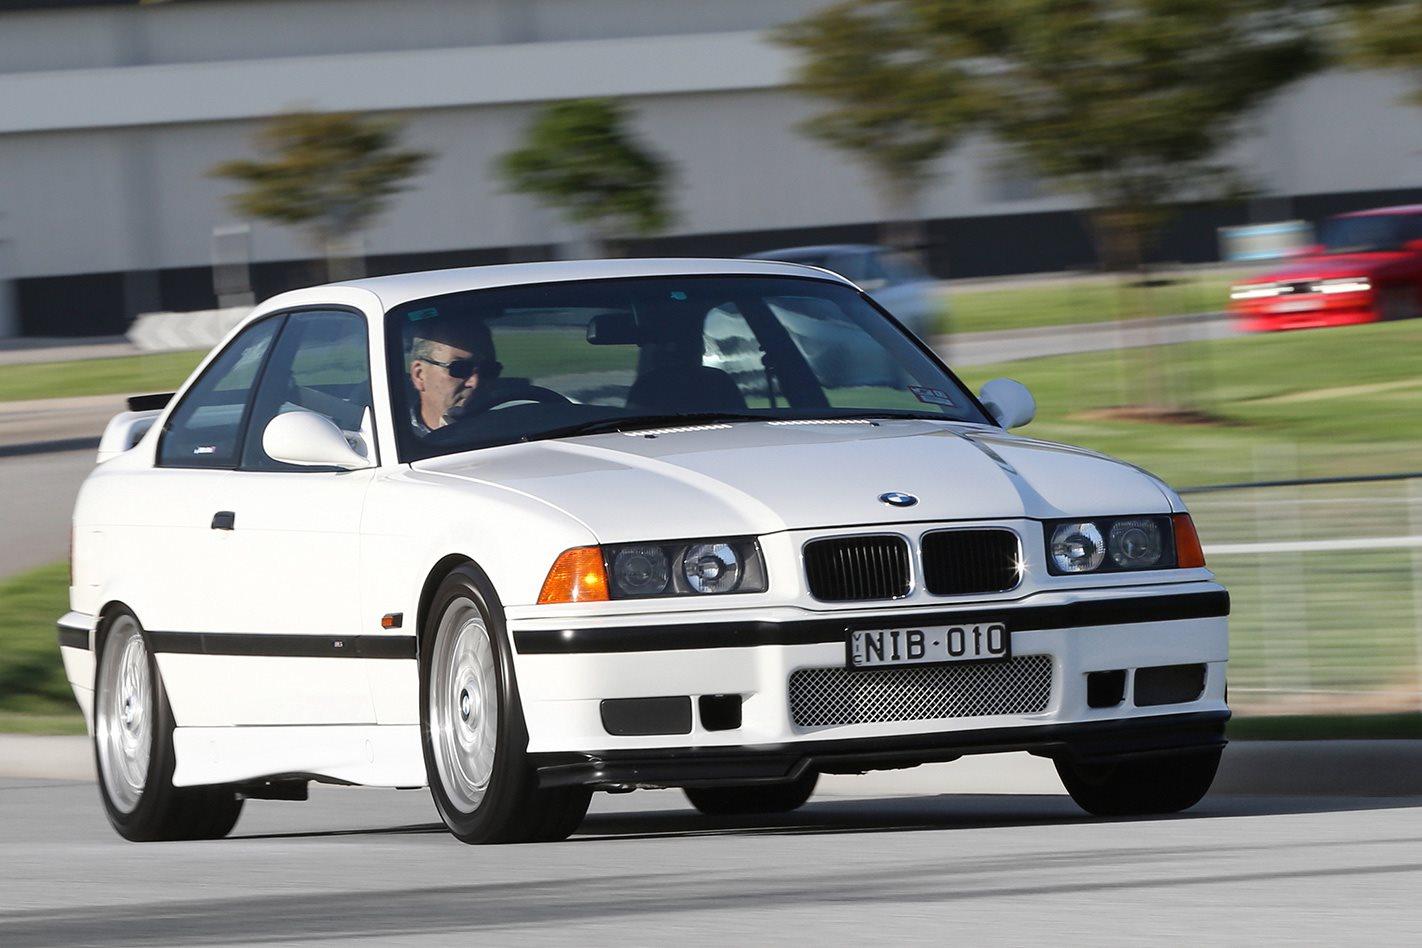 30 years of BMW M3: E36 M3R on bmw coupe, bmw sport, bmw m7, bmw 2 series, bmw 540i, bmw z8, bmw 335i, bmw 325i, bmw x4, bmw 135i, bmw 750li, bmw gt, bmw z3, bmw e30, bmw x7, bmw 850 csi, bmw 4 series, bmw x9,